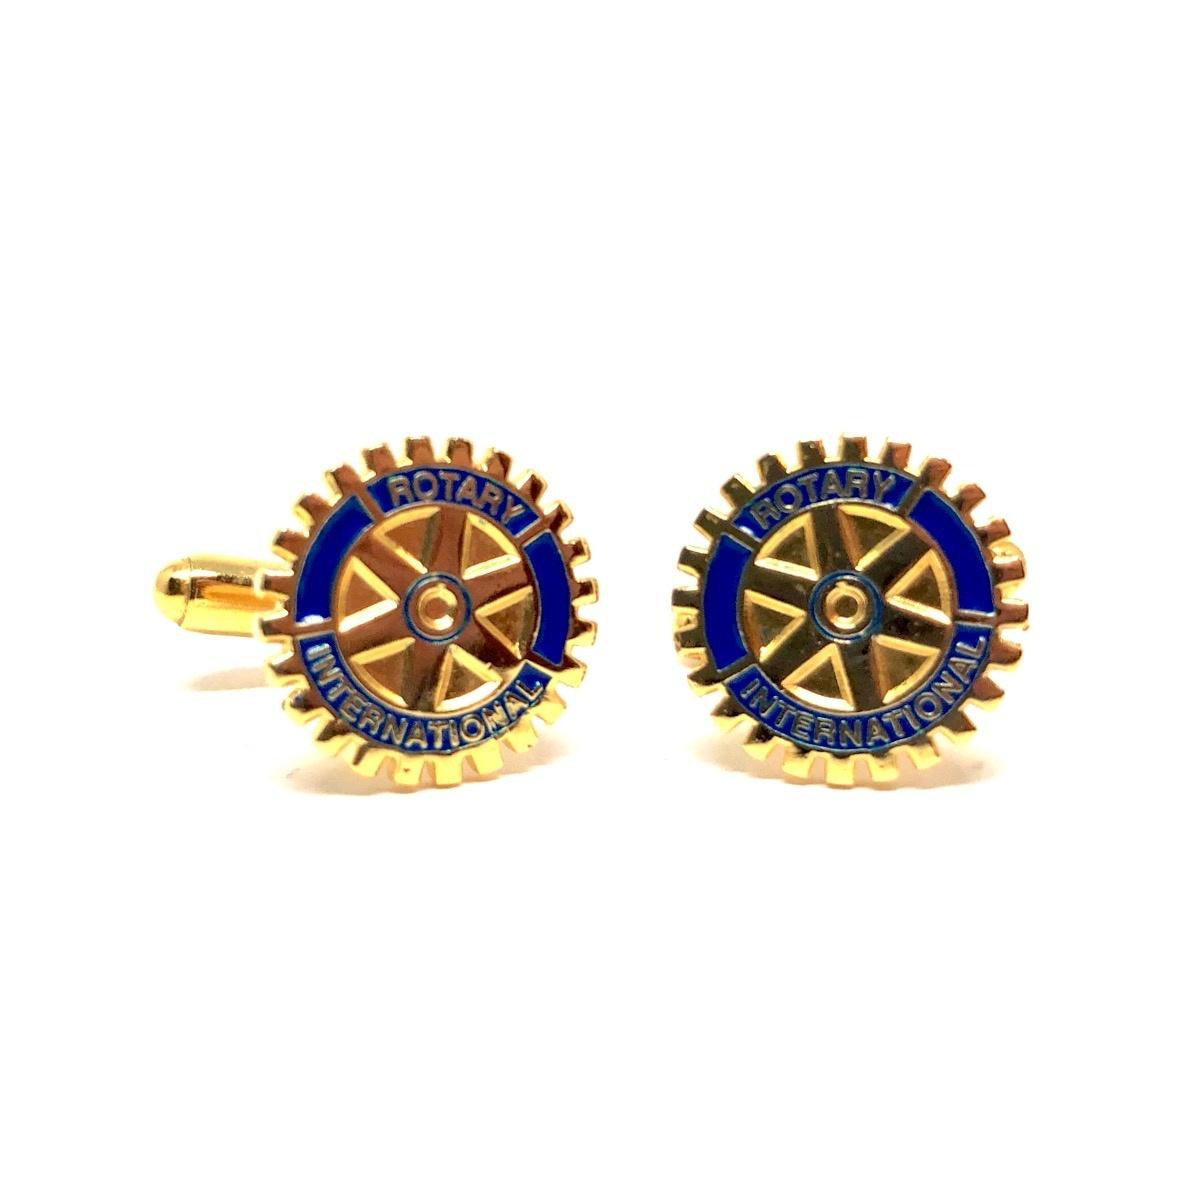 Boutons de manchette Rotary